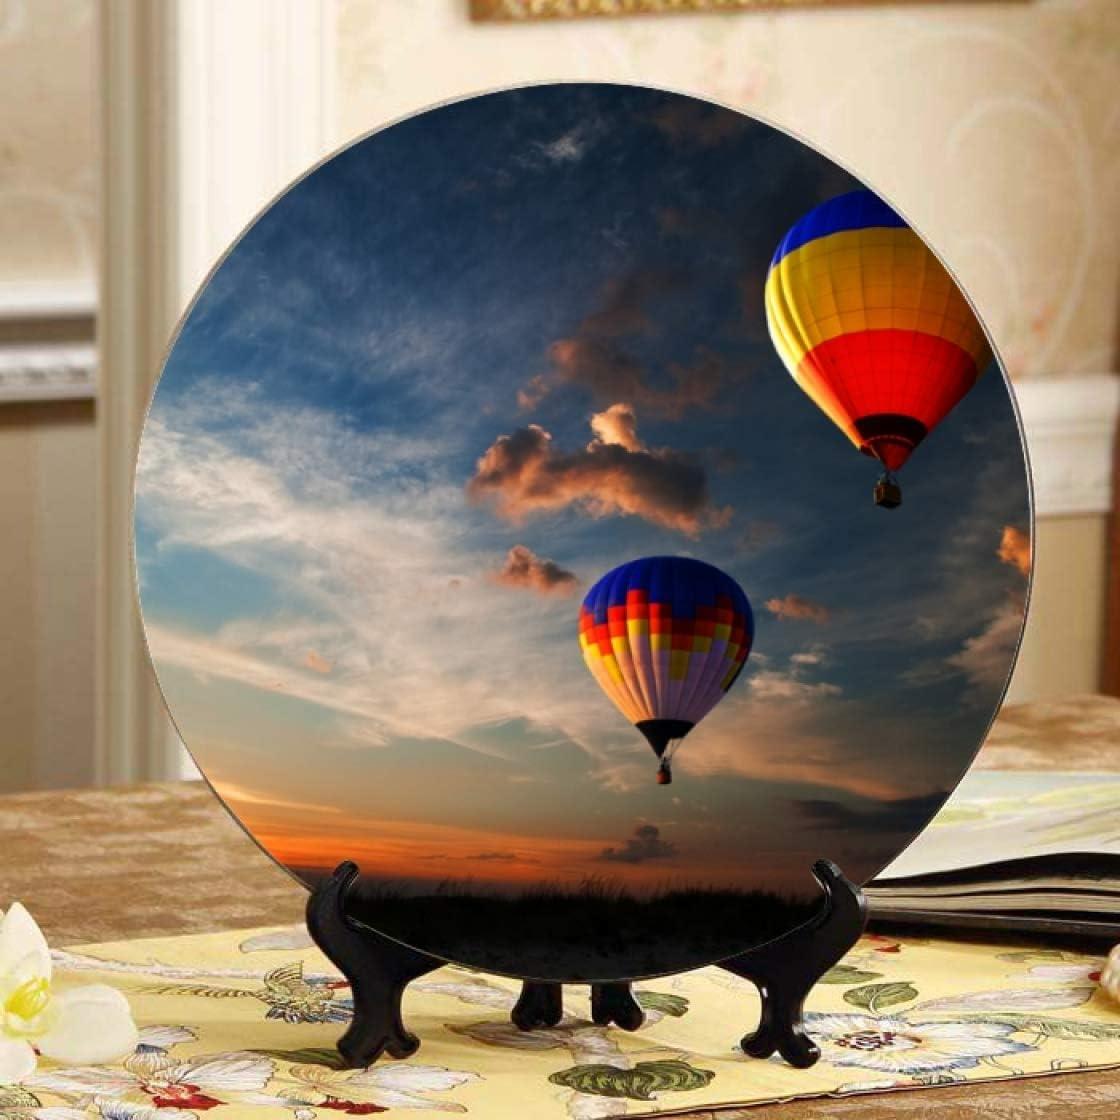 Lajro Hot Air Balloon Race at Plate Ceramic Fancy Sunrise Rapid rise Decora Popular